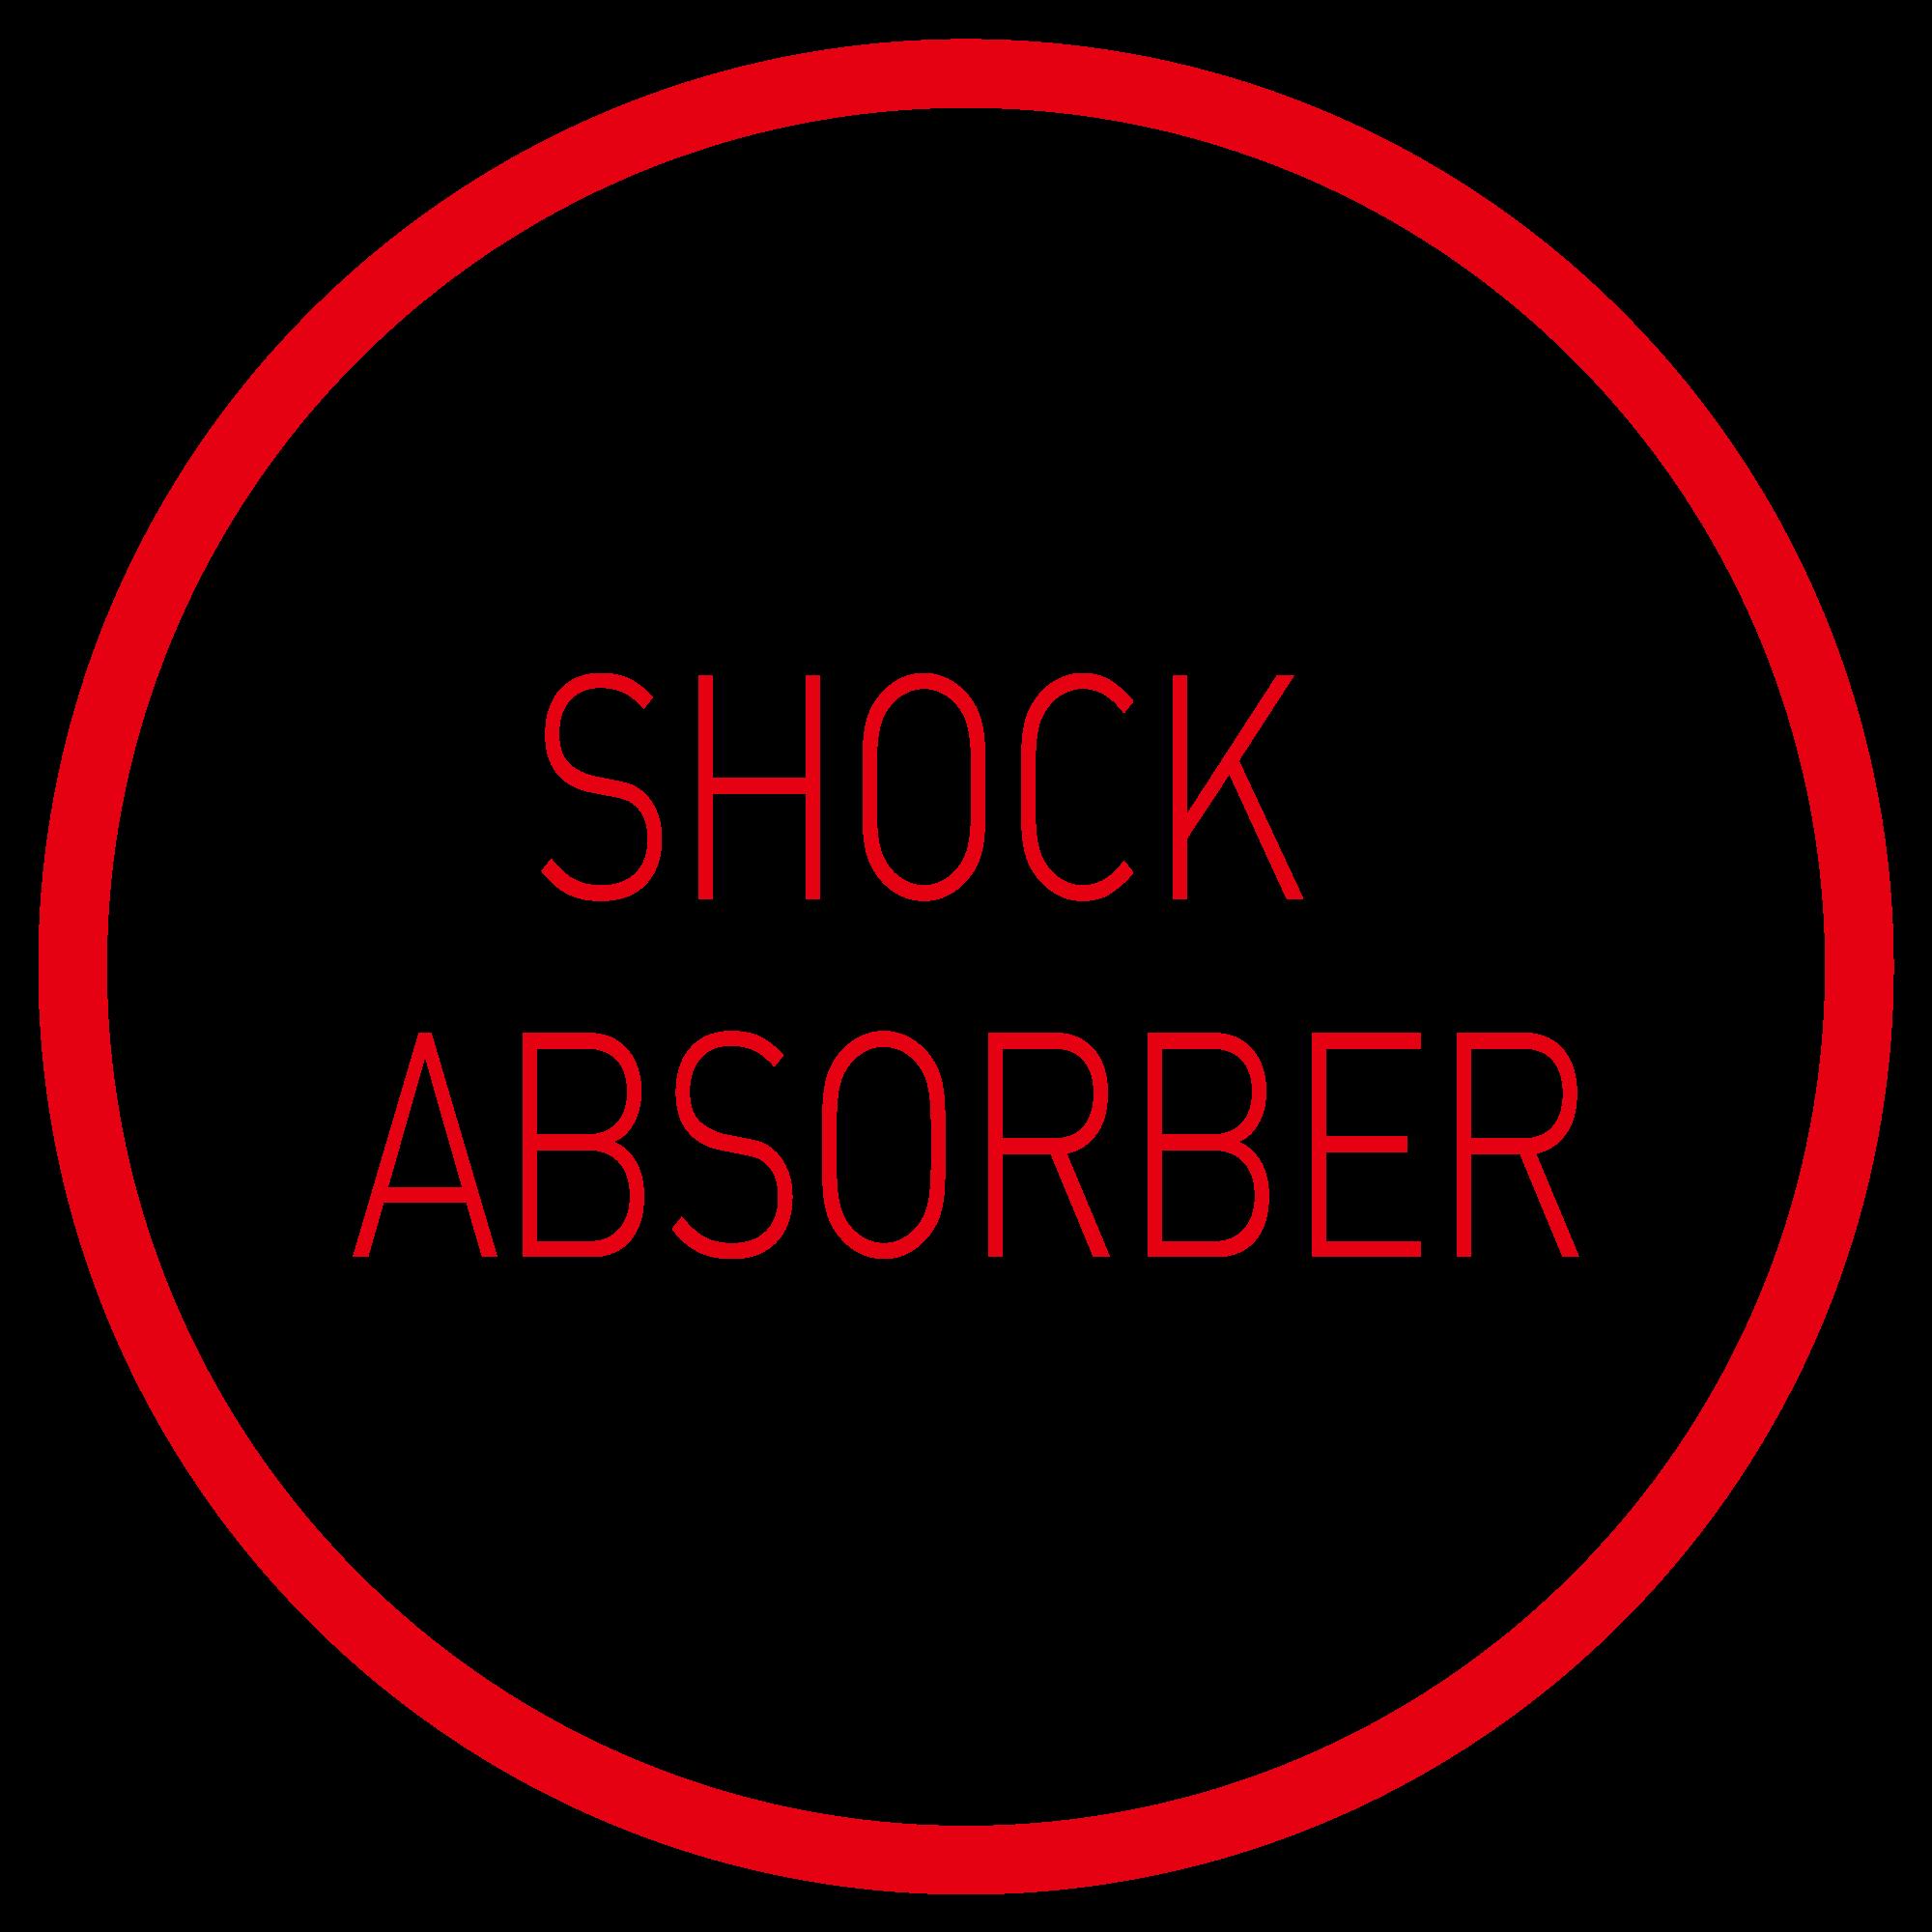 Selle-Italia-icon-14-shock-absorber